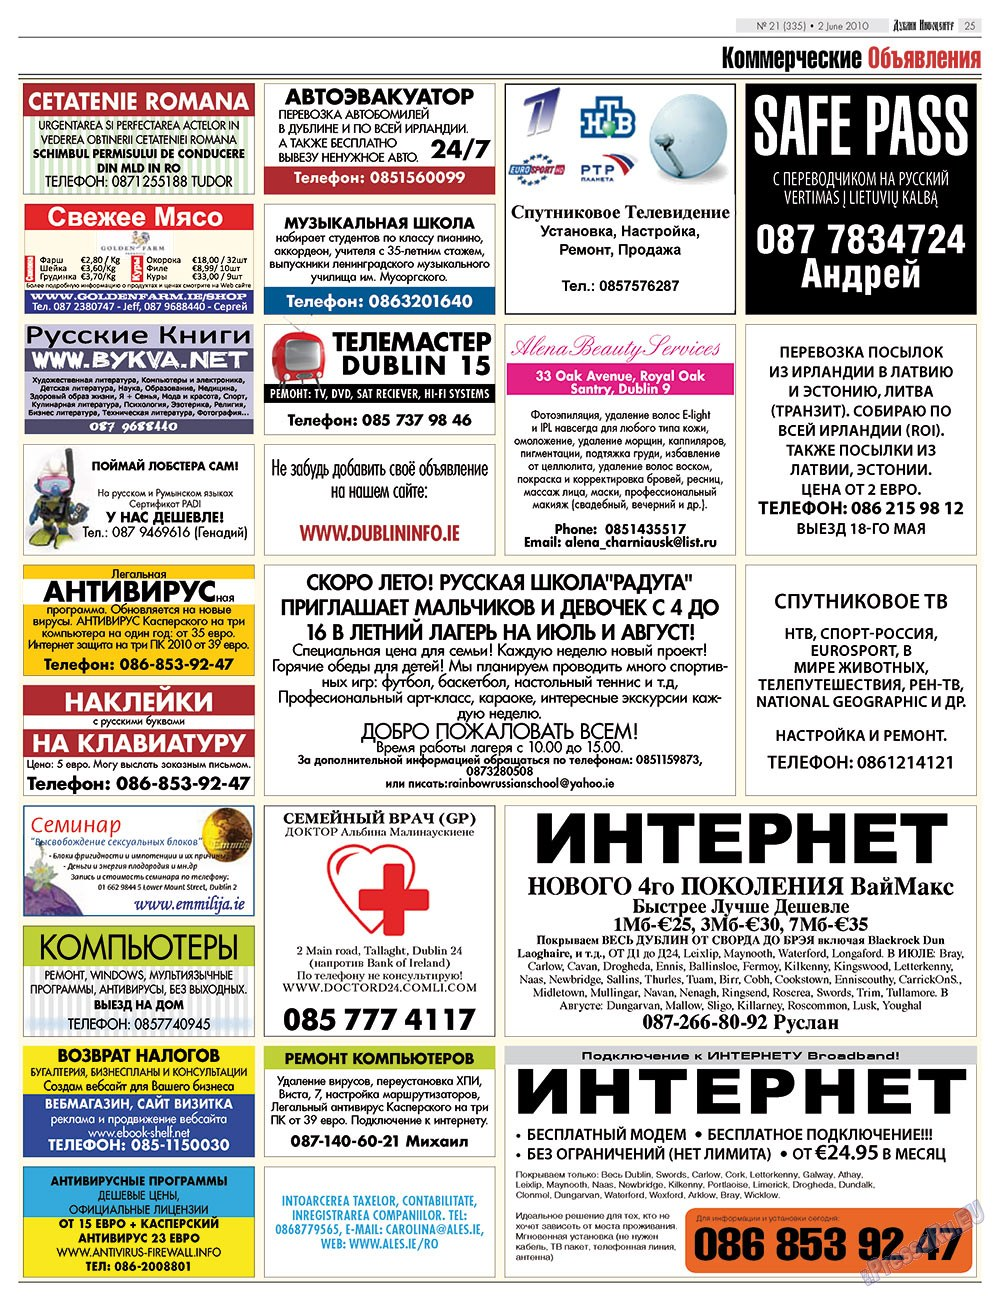 Дублин инфоцентр (газета). 2010 год, номер 21, стр. 25